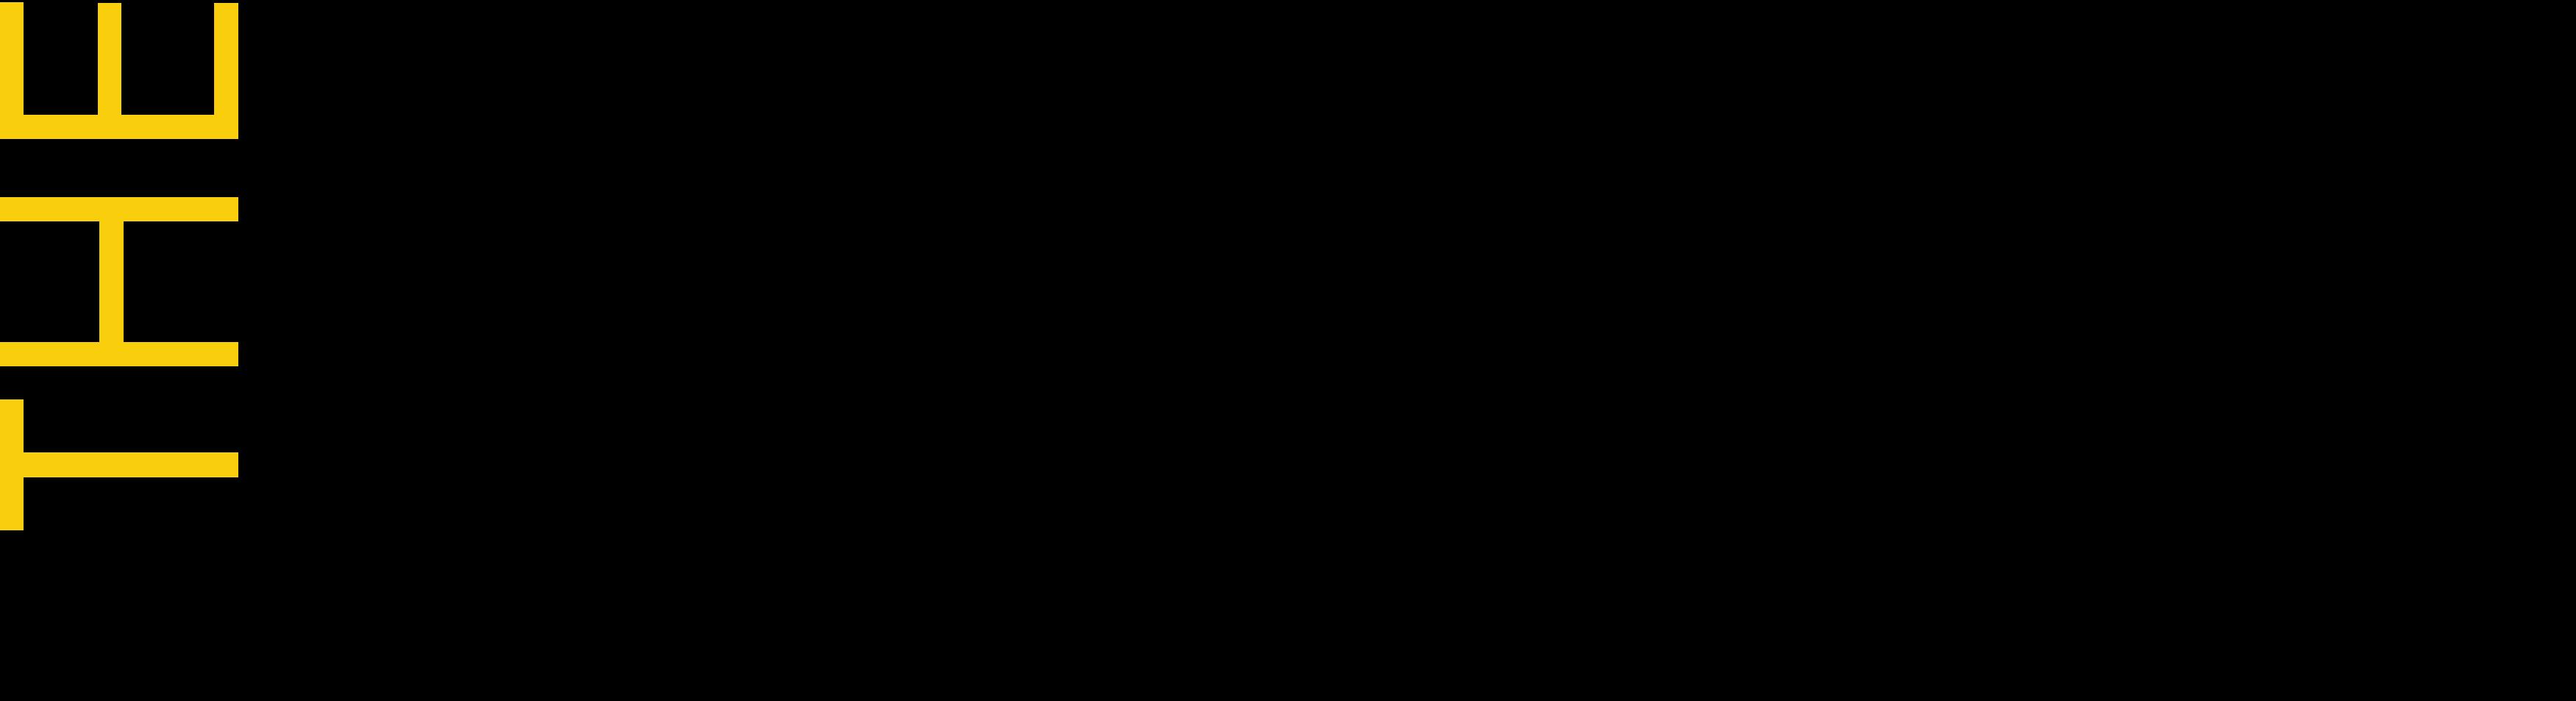 g4184